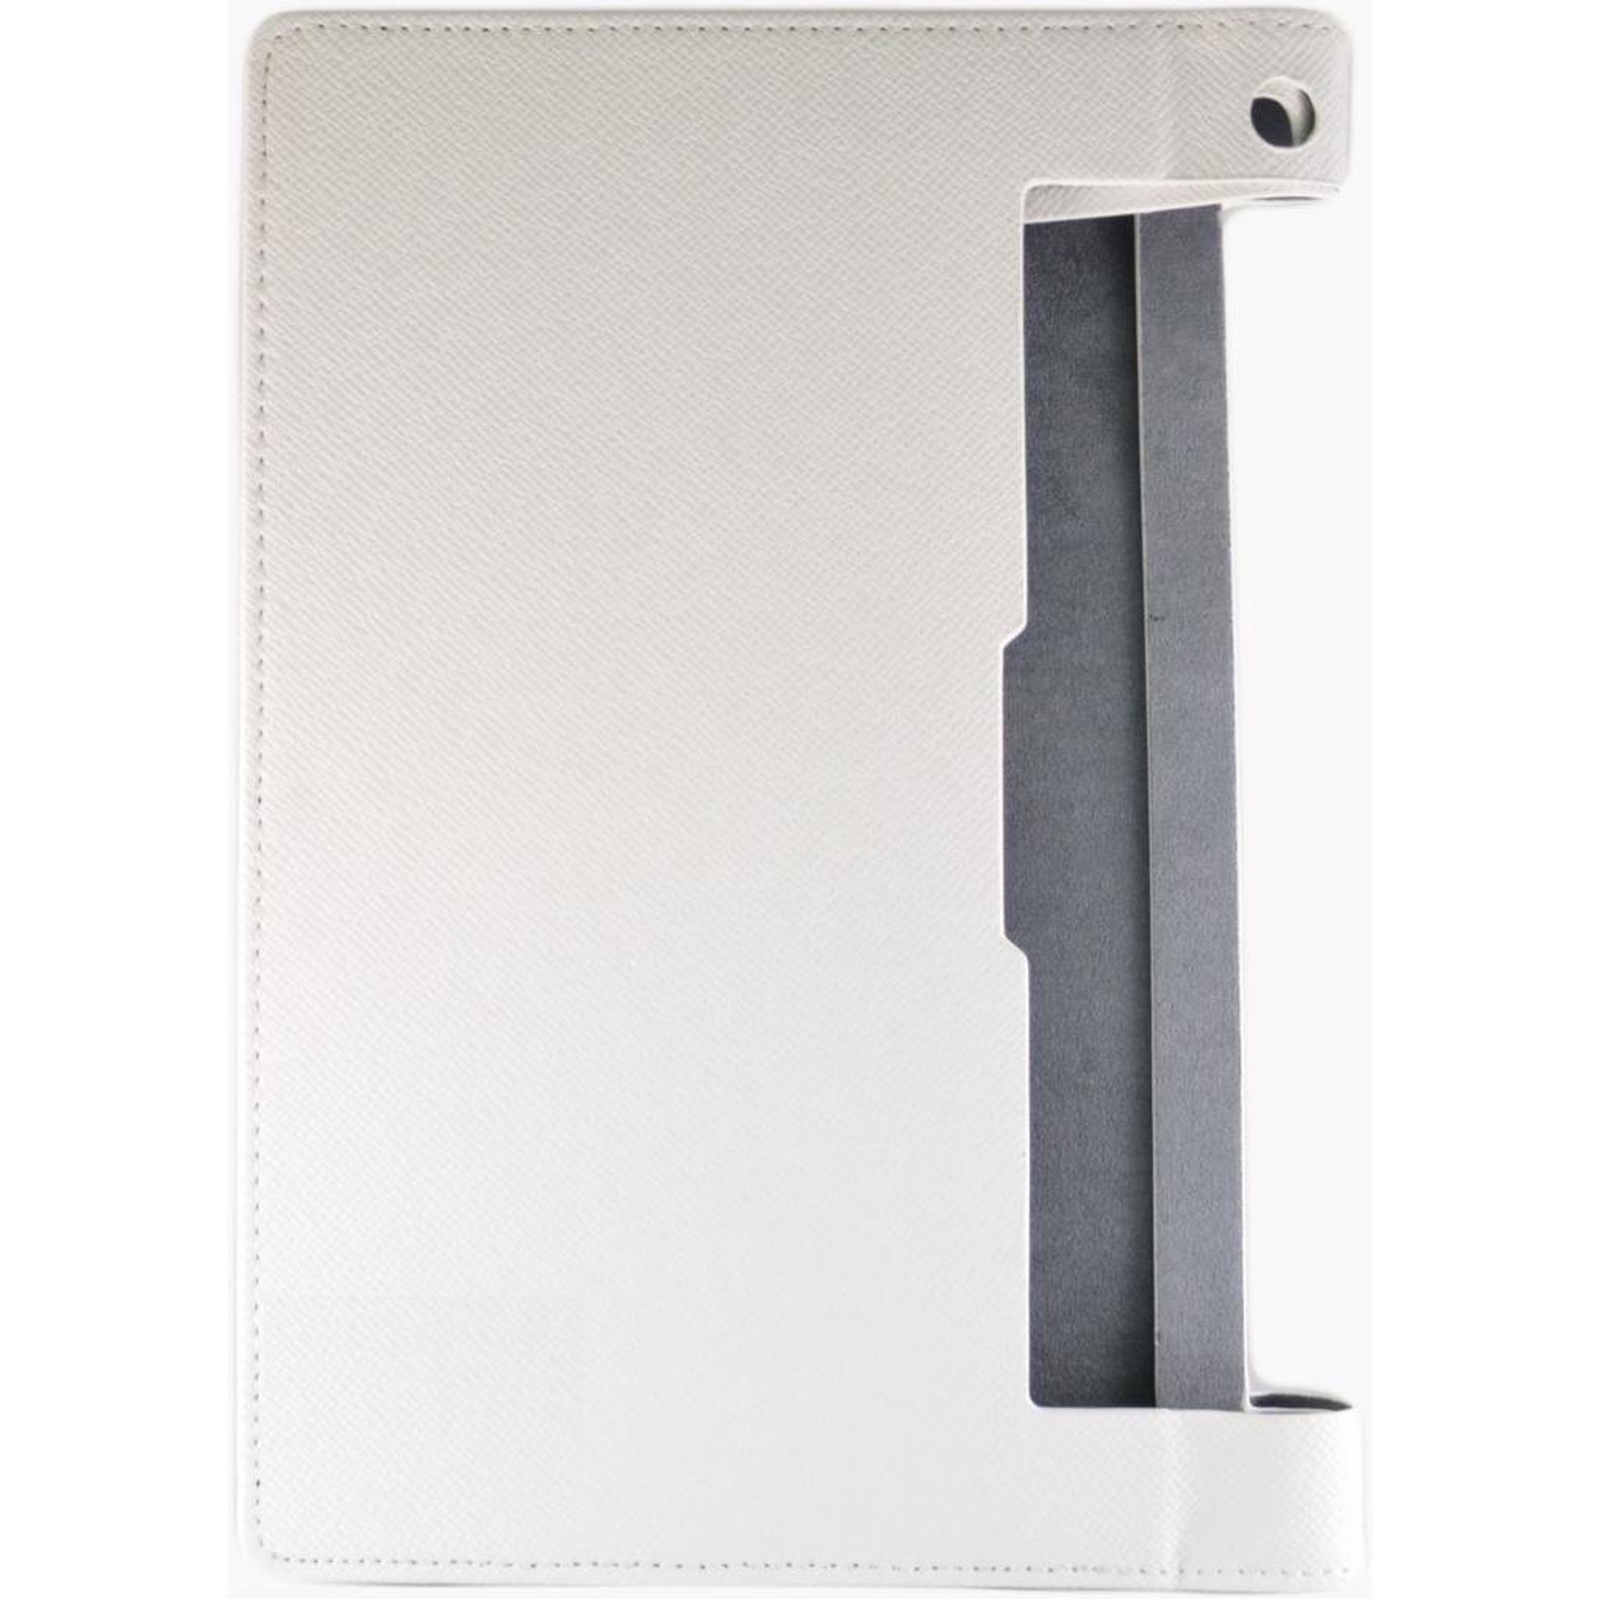 "Чехол для планшета Pro-case для Lenovo B8000 Yoga 10"" white (PC B8000w) изображение 2"